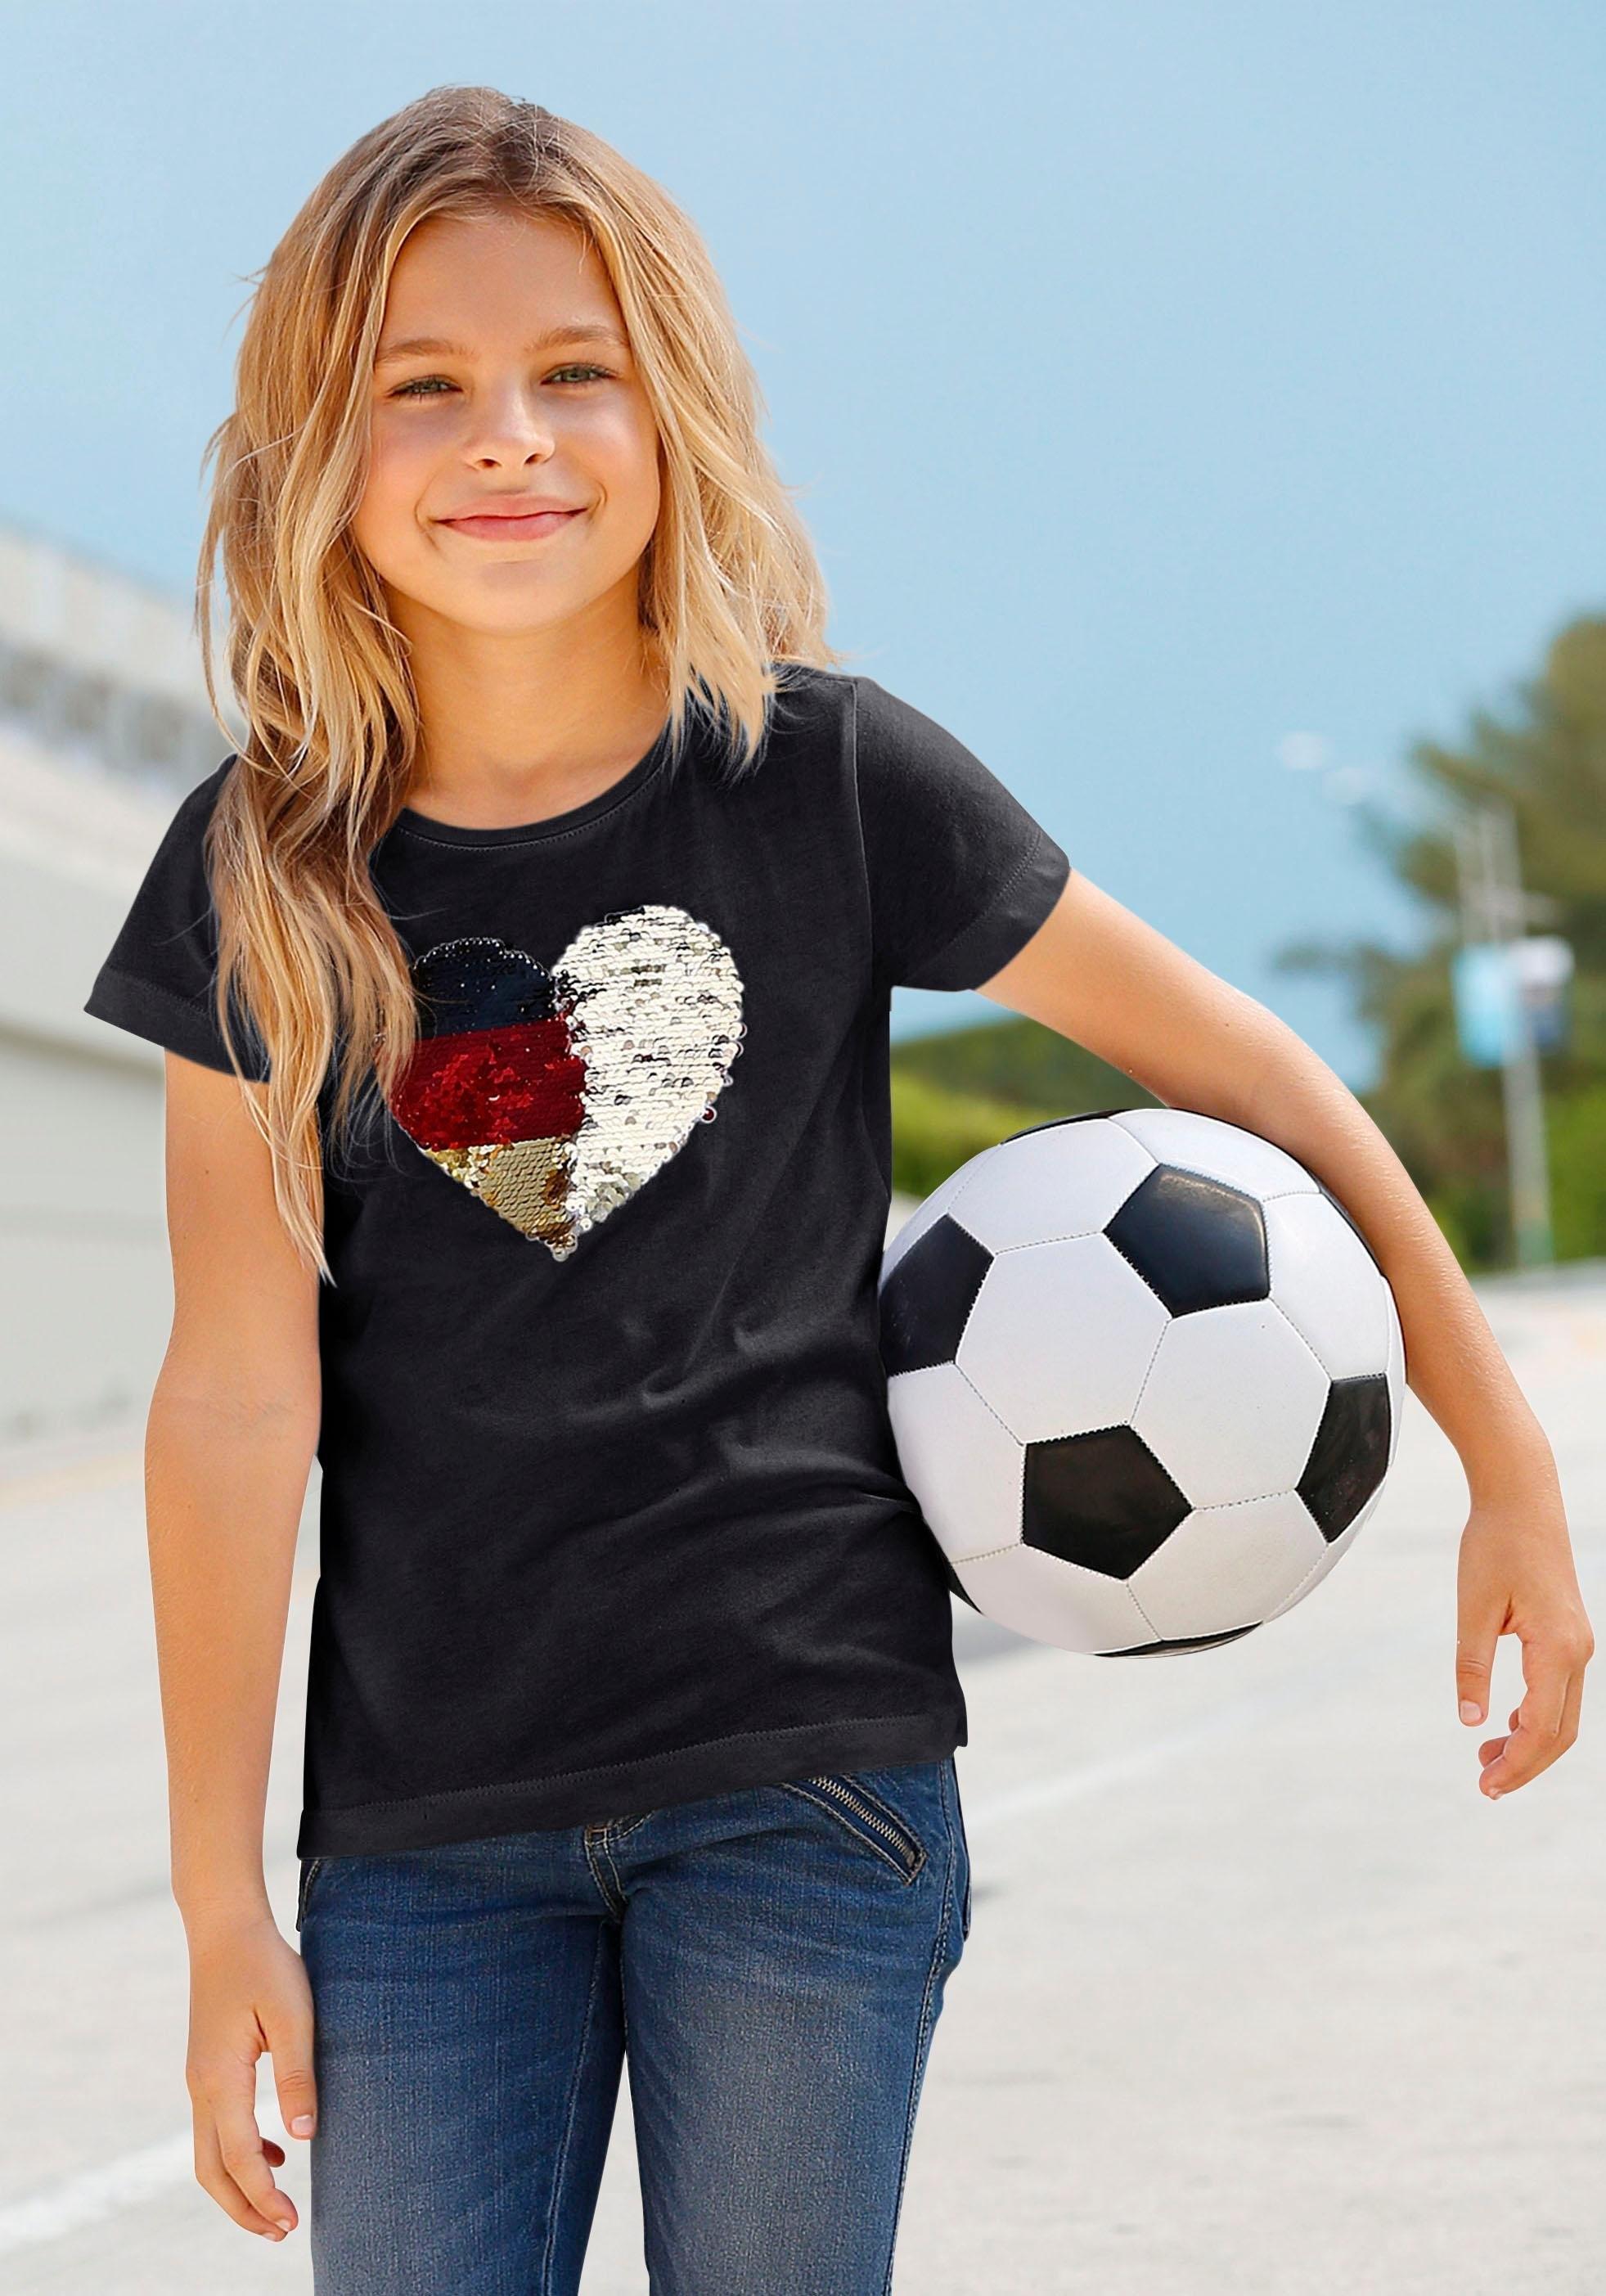 ARIZONA T-shirt »Fußballshirt« bestellen: 30 dagen bedenktijd